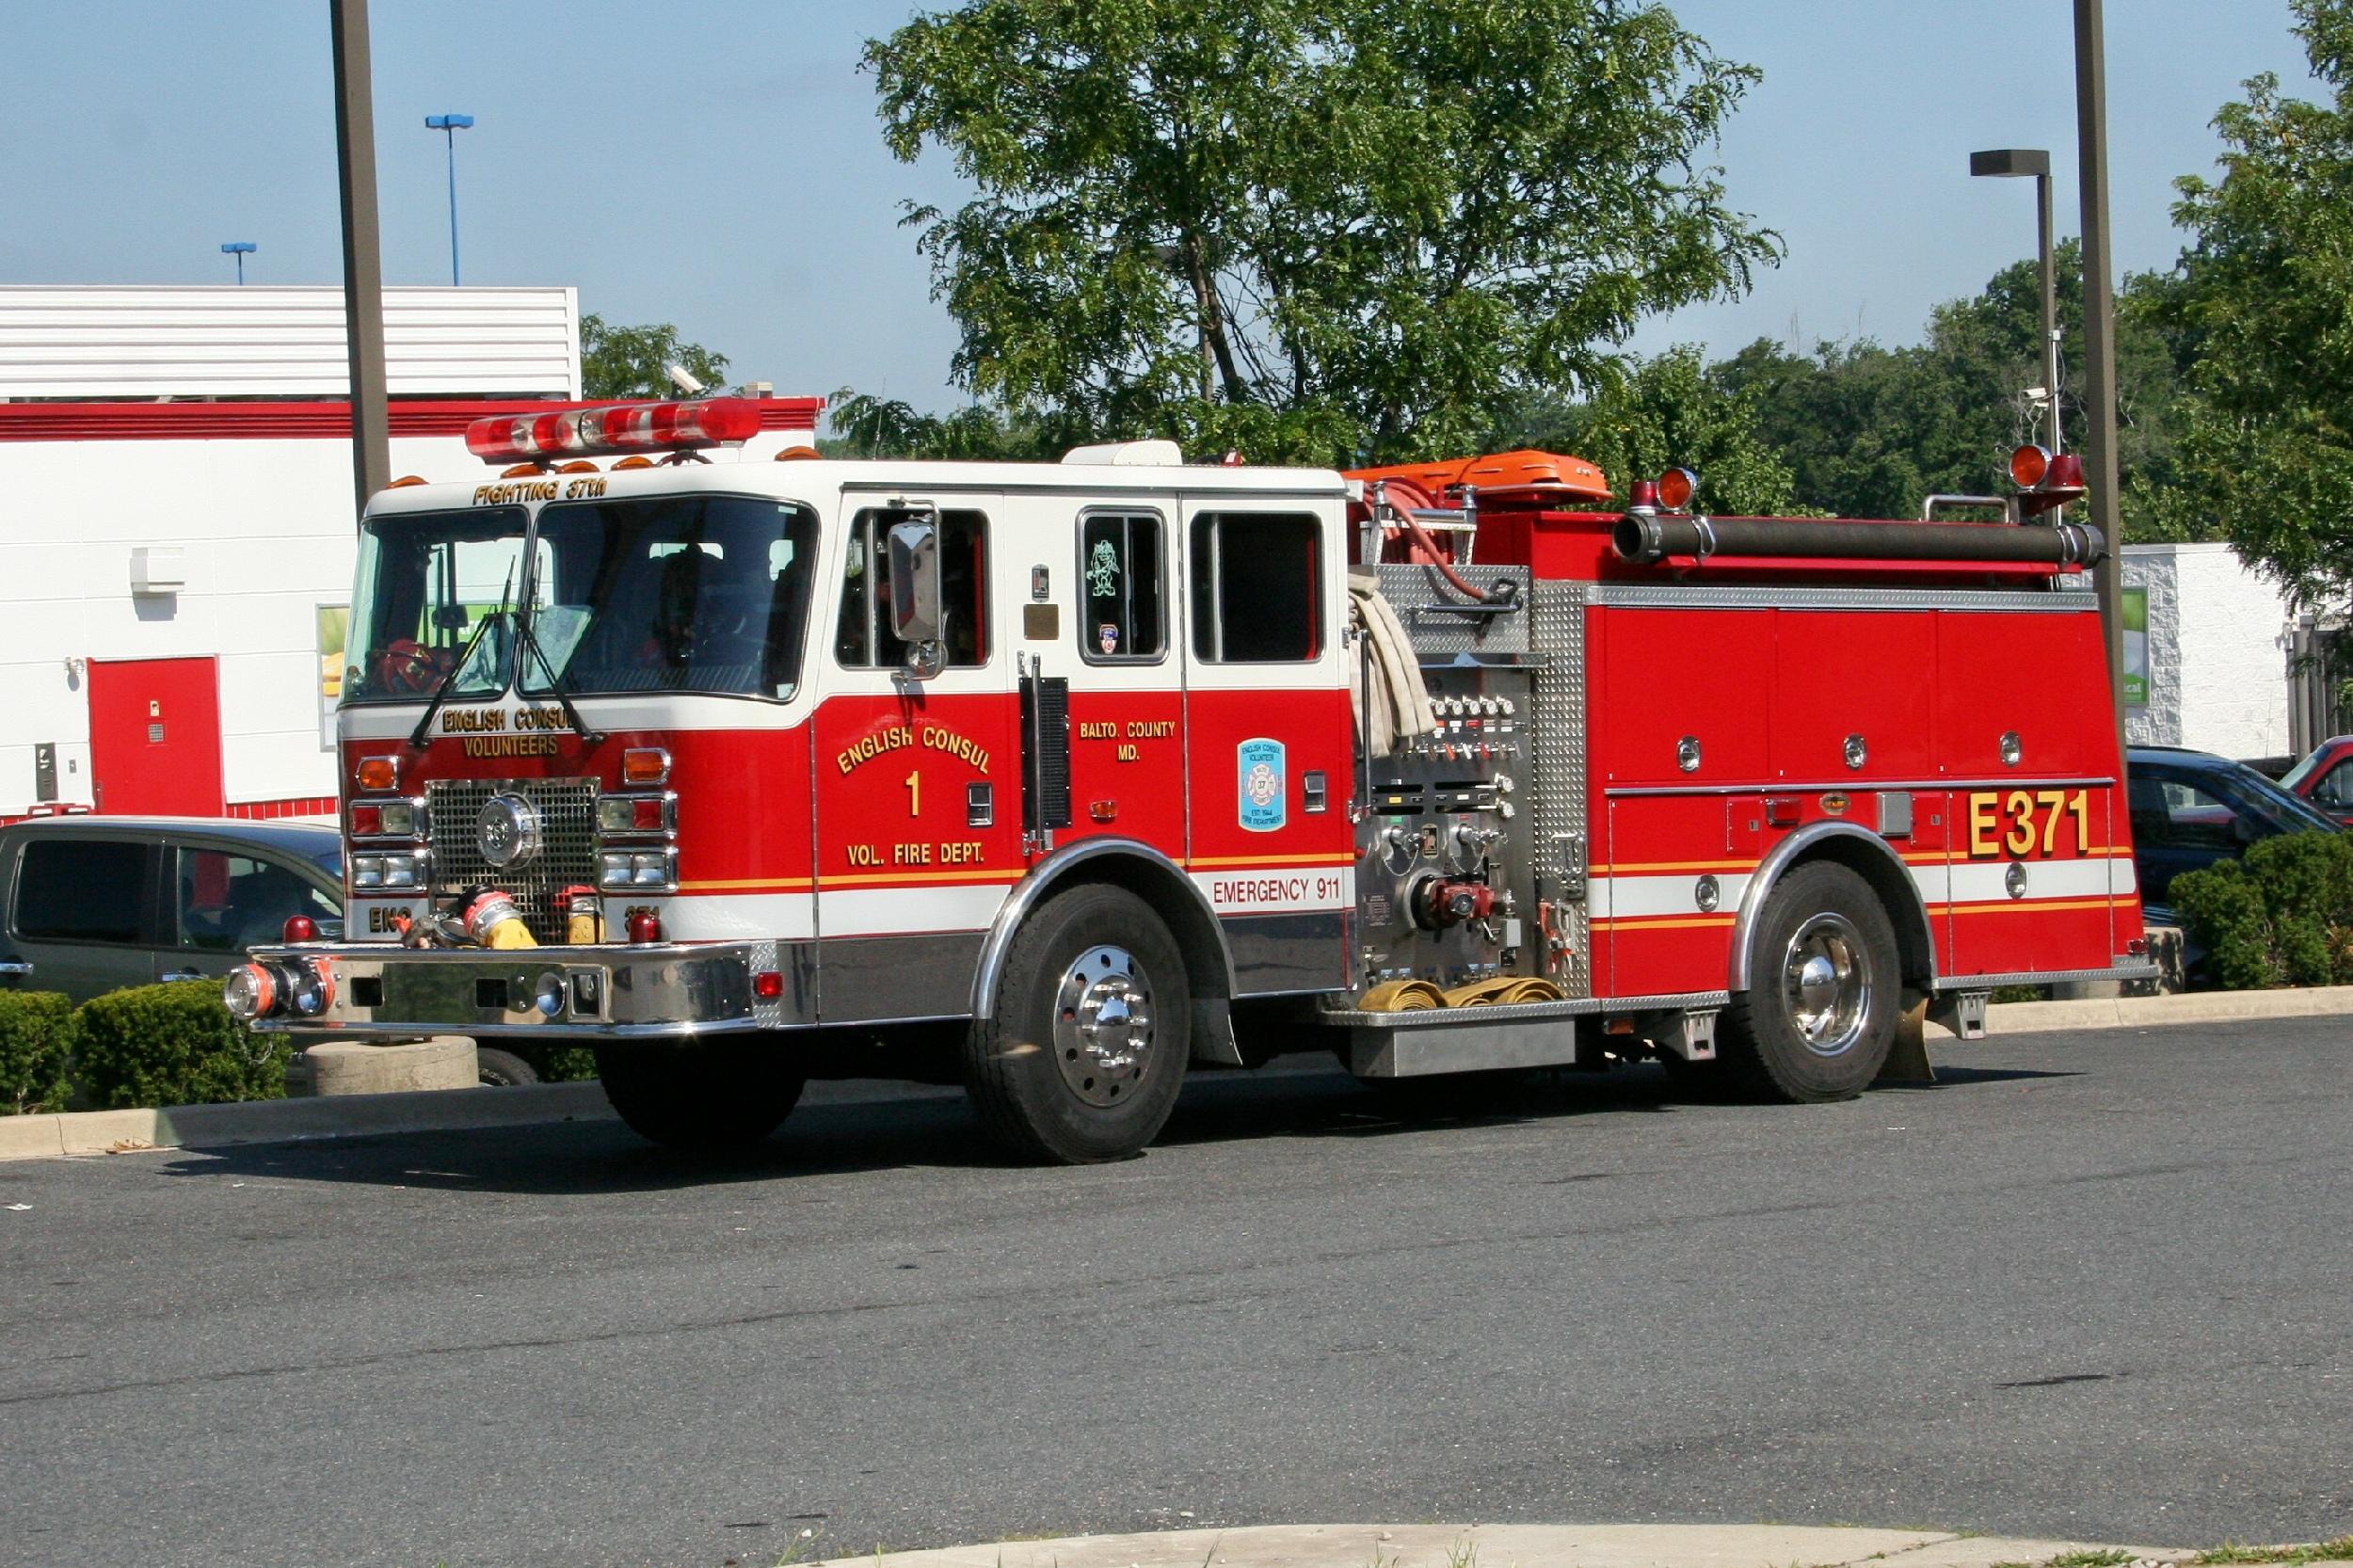 MD English Consul Volunteer Fire Department 37